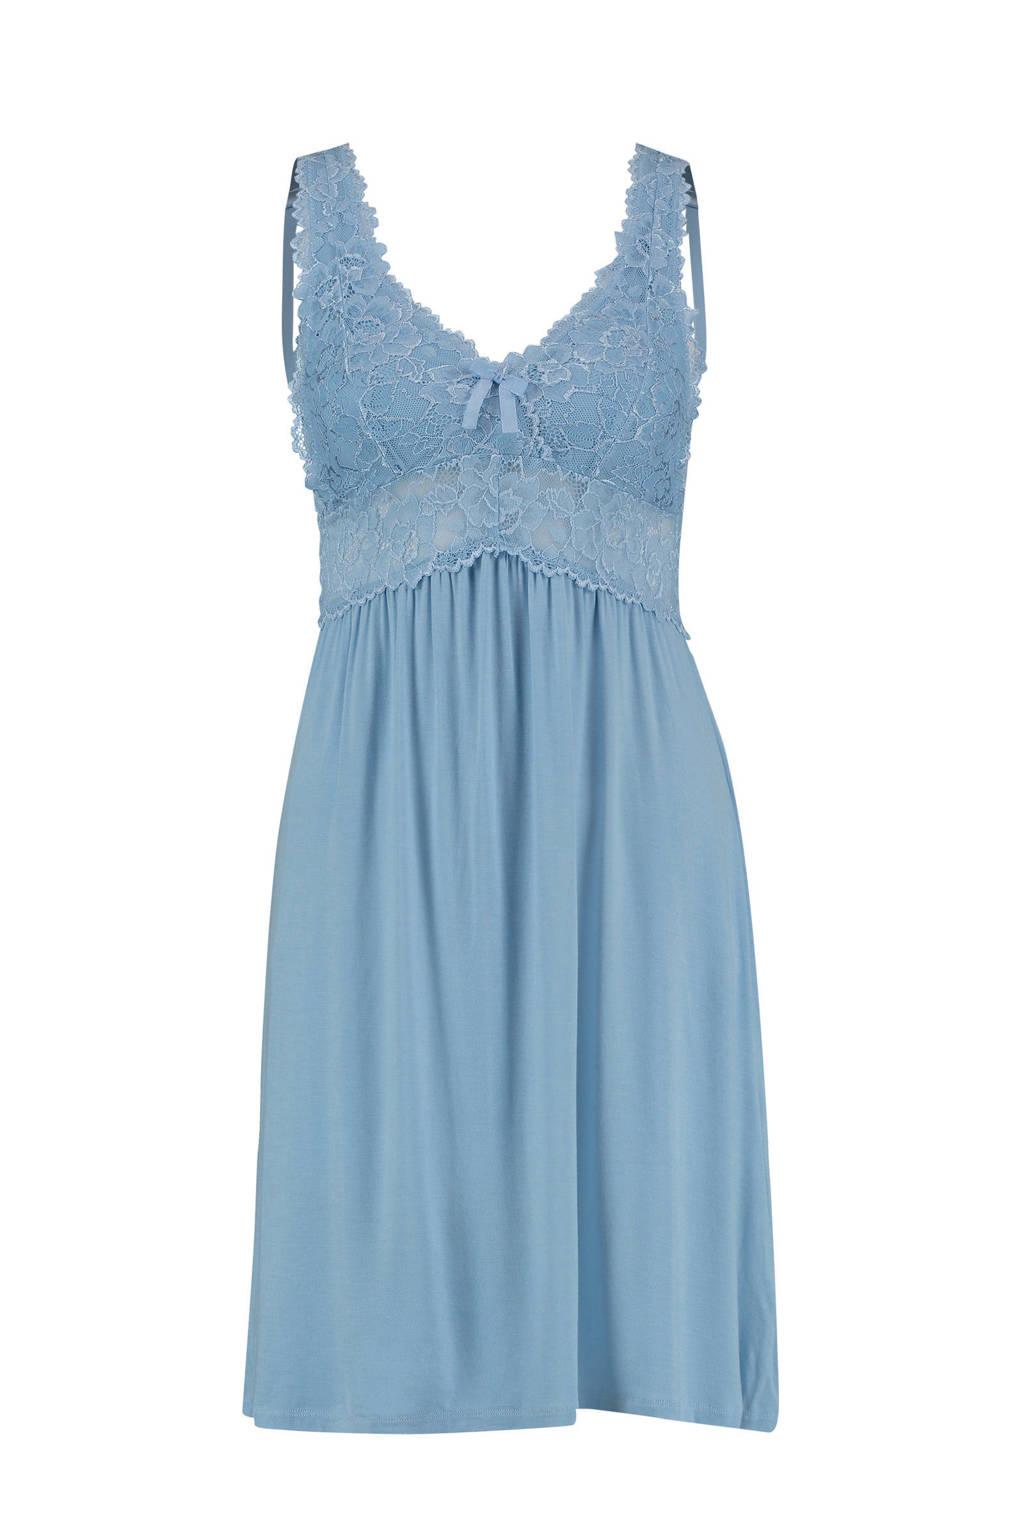 Hunkemöller Modal Lace slipdress, Lichtblauw